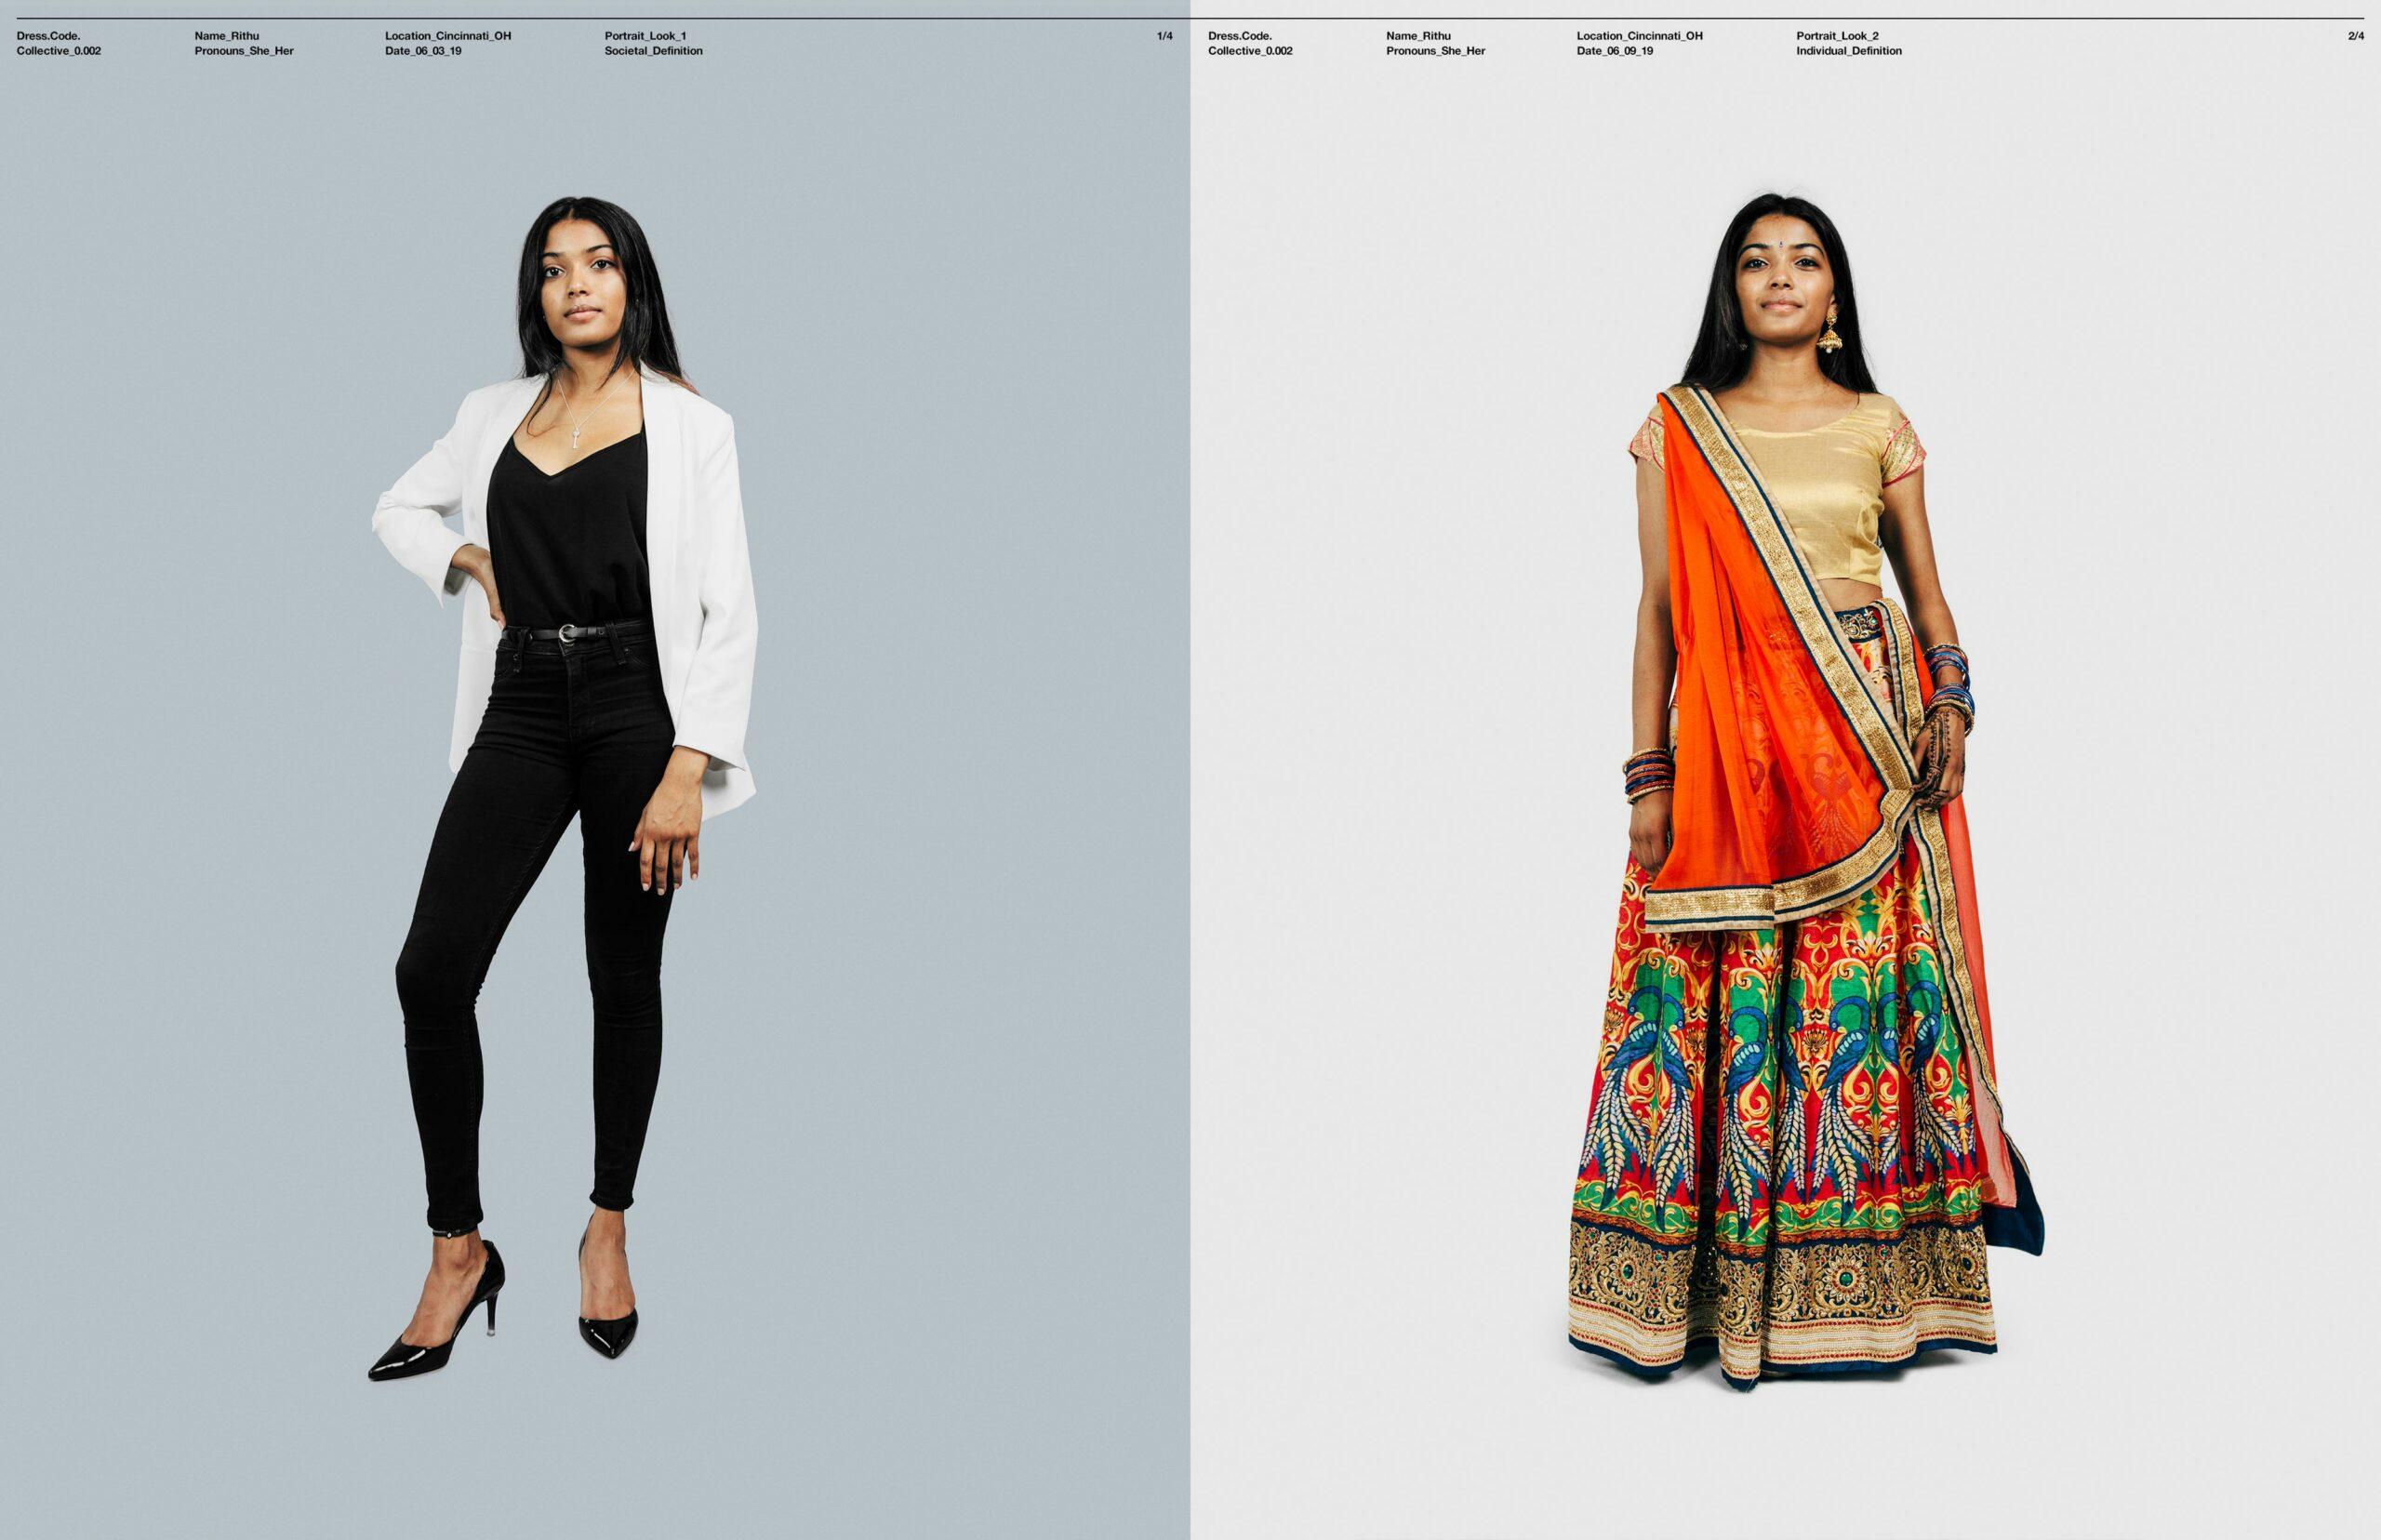 01-Dress-Code01